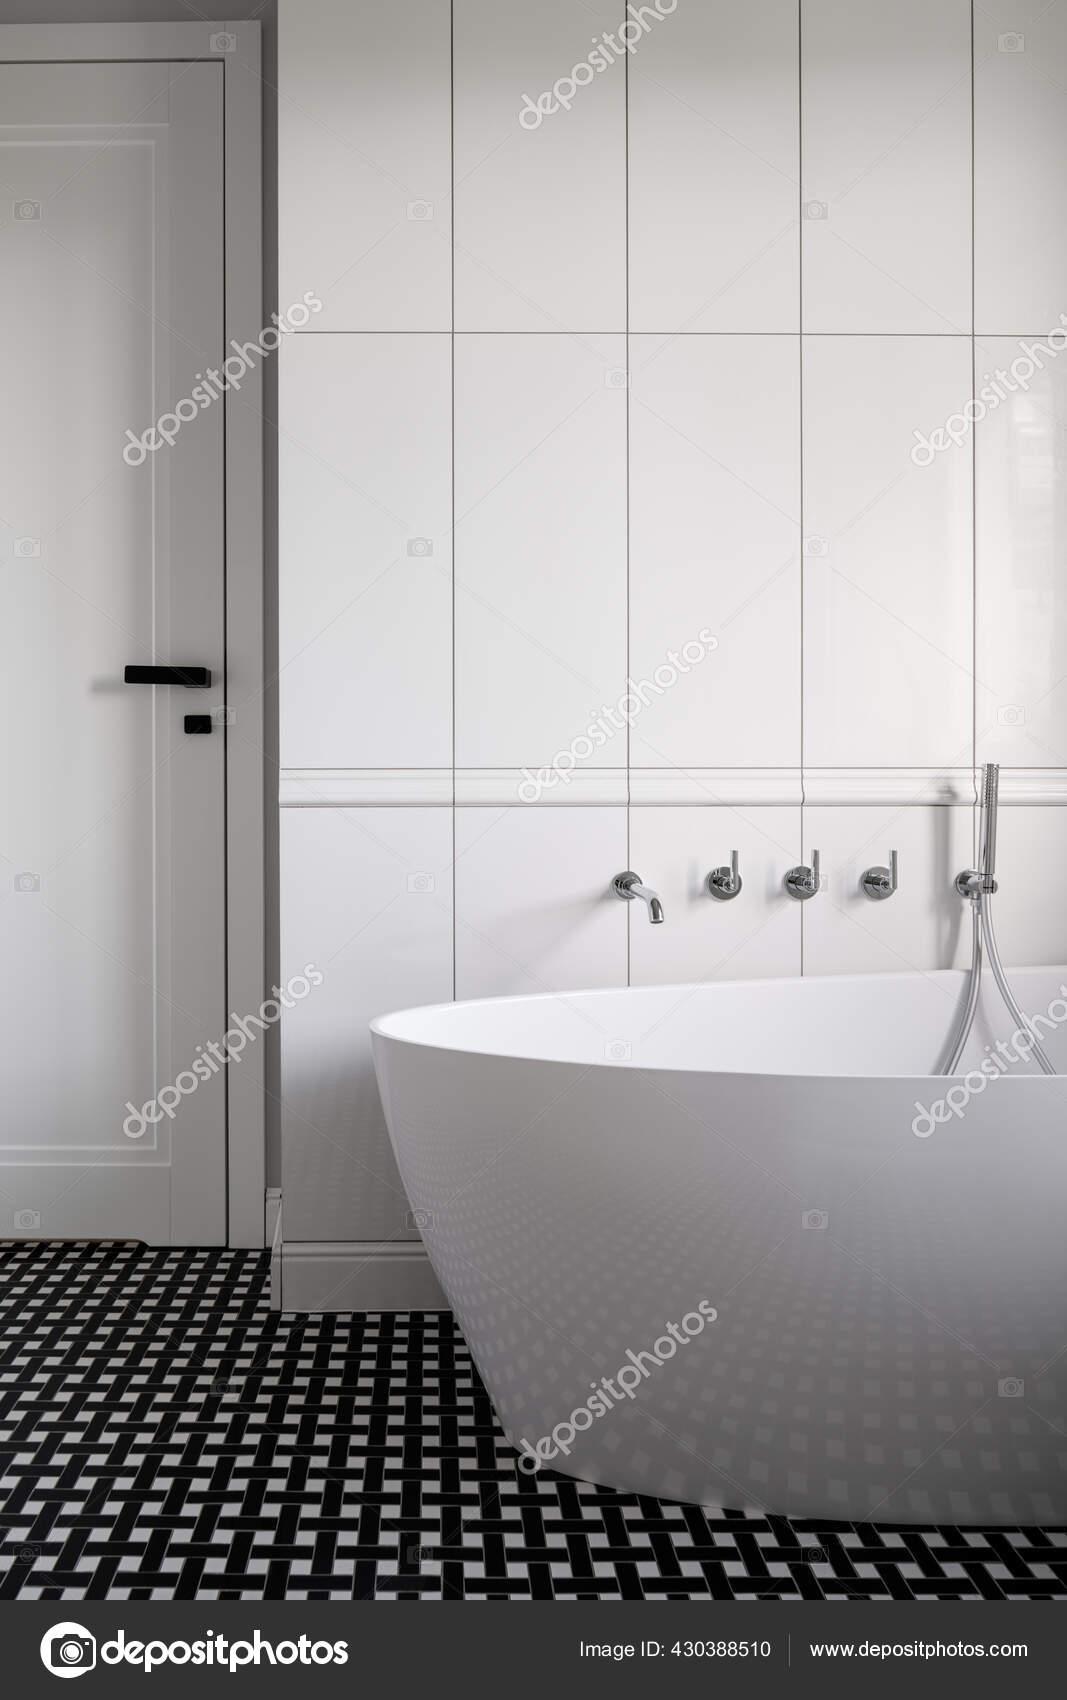 https depositphotos com 430388510 stock photo beautiful bathroom luxury freestanding bathtub html